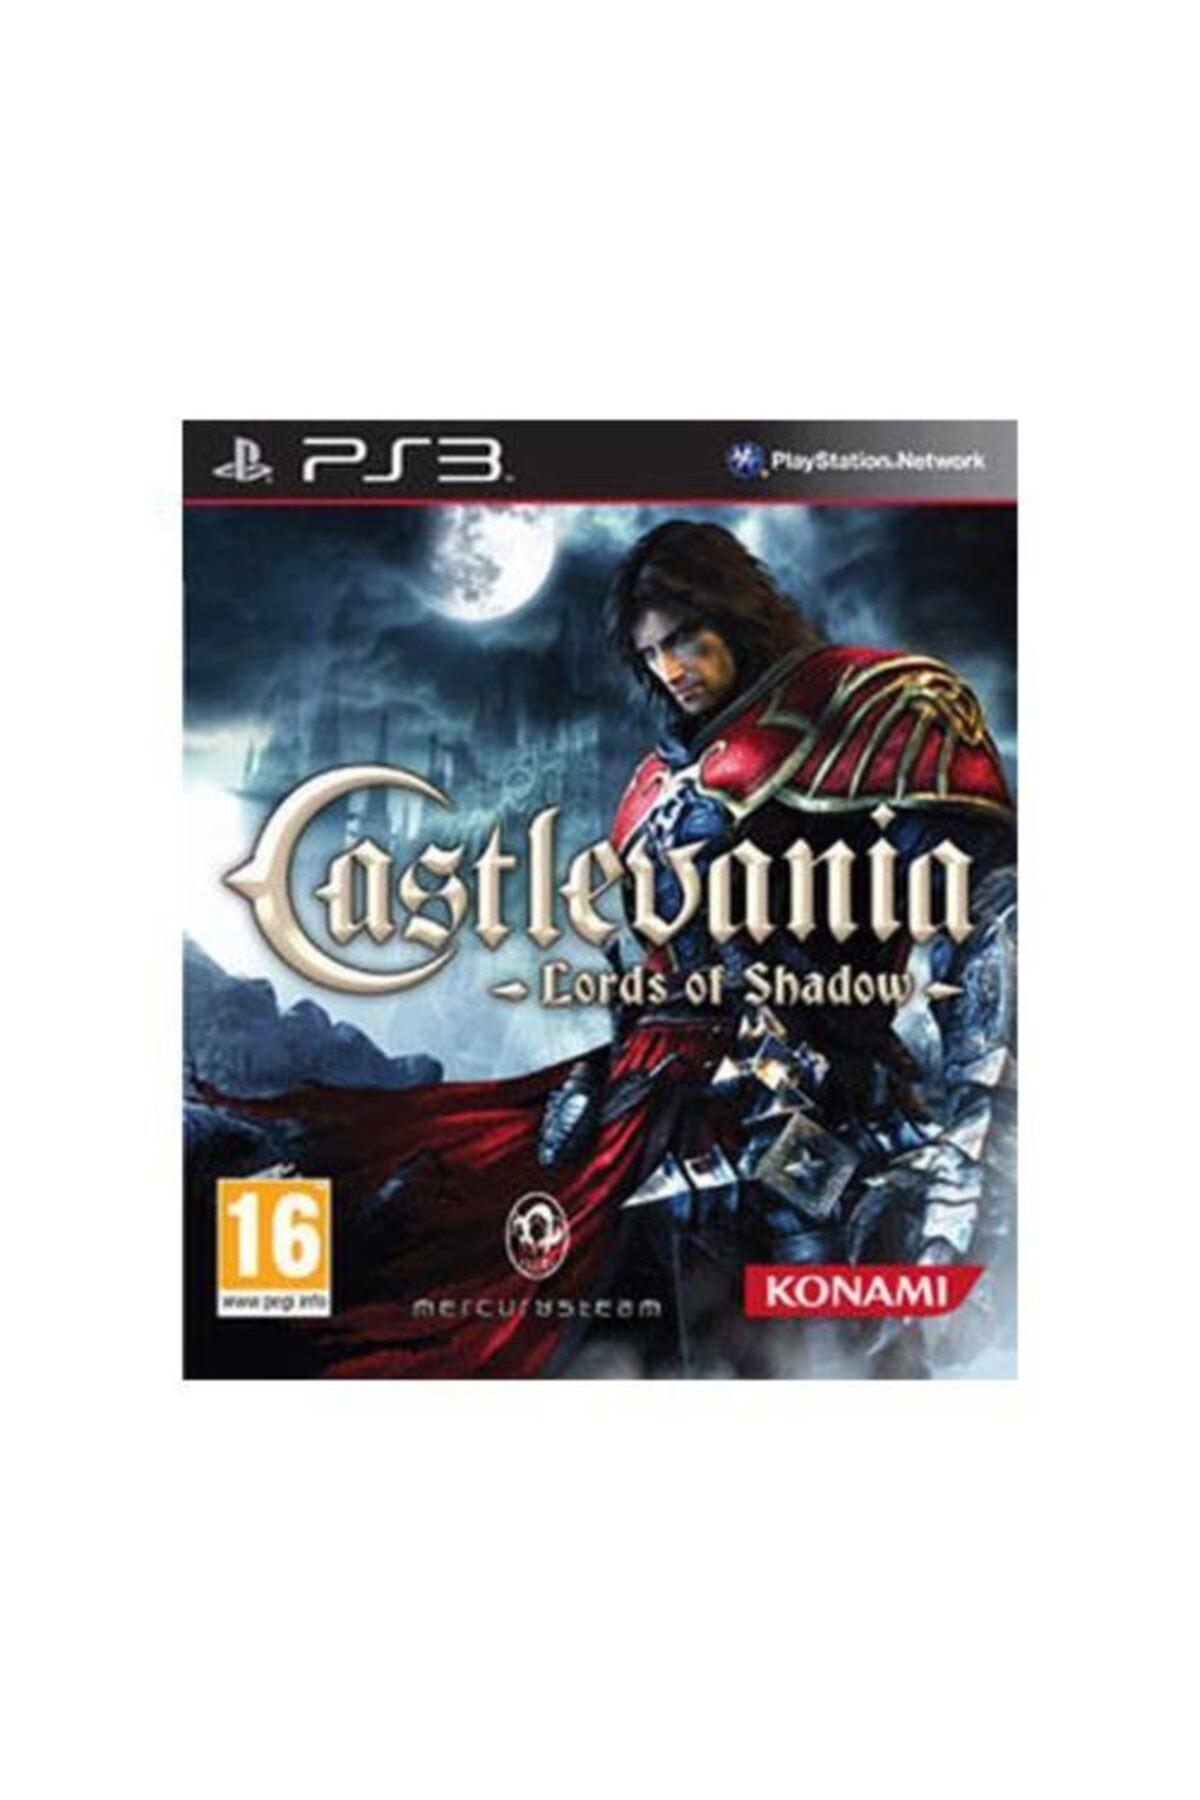 KONAMI Ps3 Oyun Castlevania Lords Of Shadow Playstation 3 1